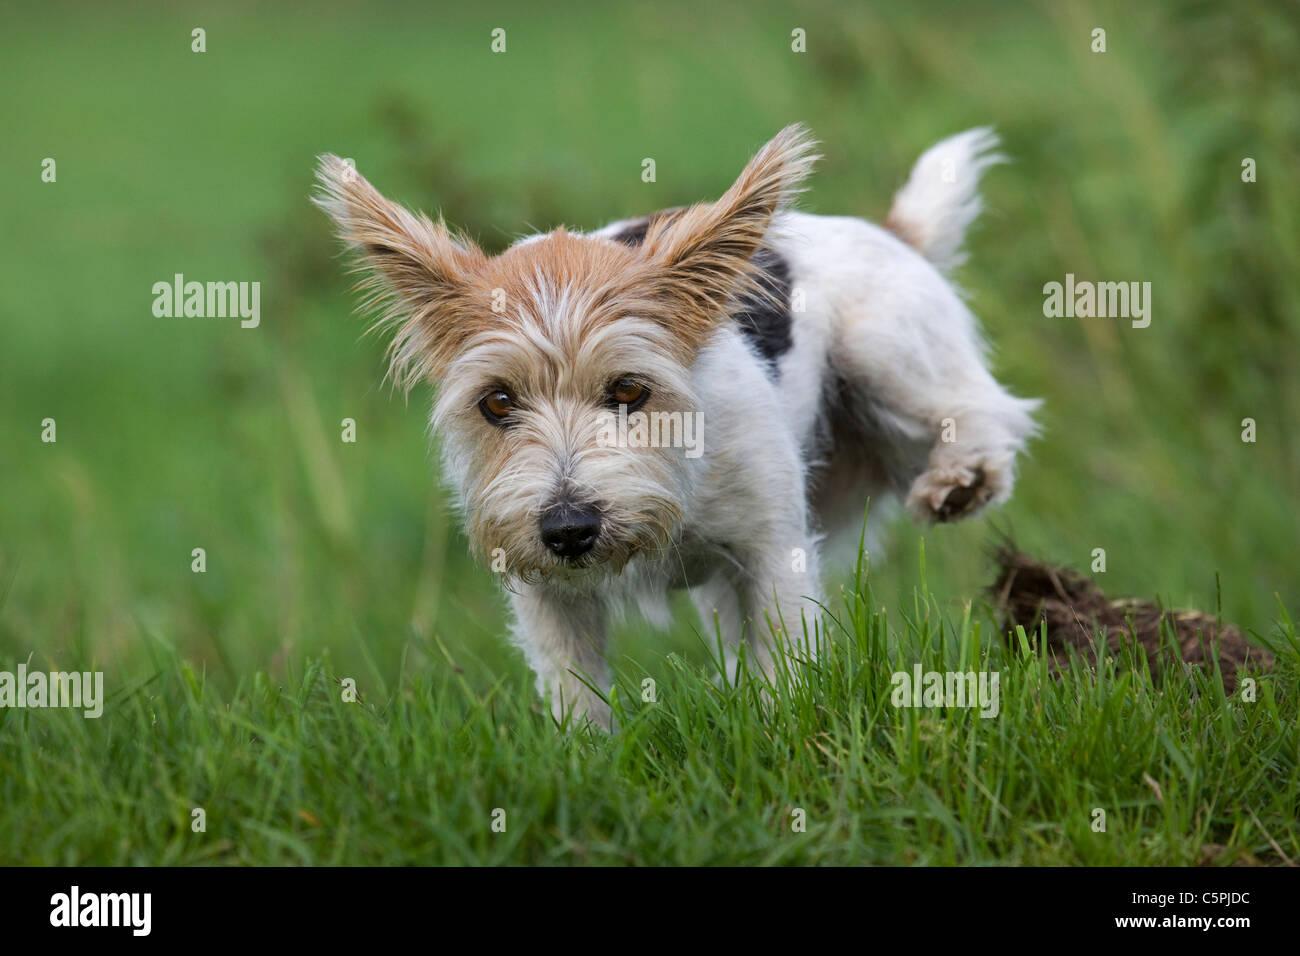 Rough-rivestito Jack Russell Terrier (Canis lupus familiaris) in esecuzione nel campo Immagini Stock